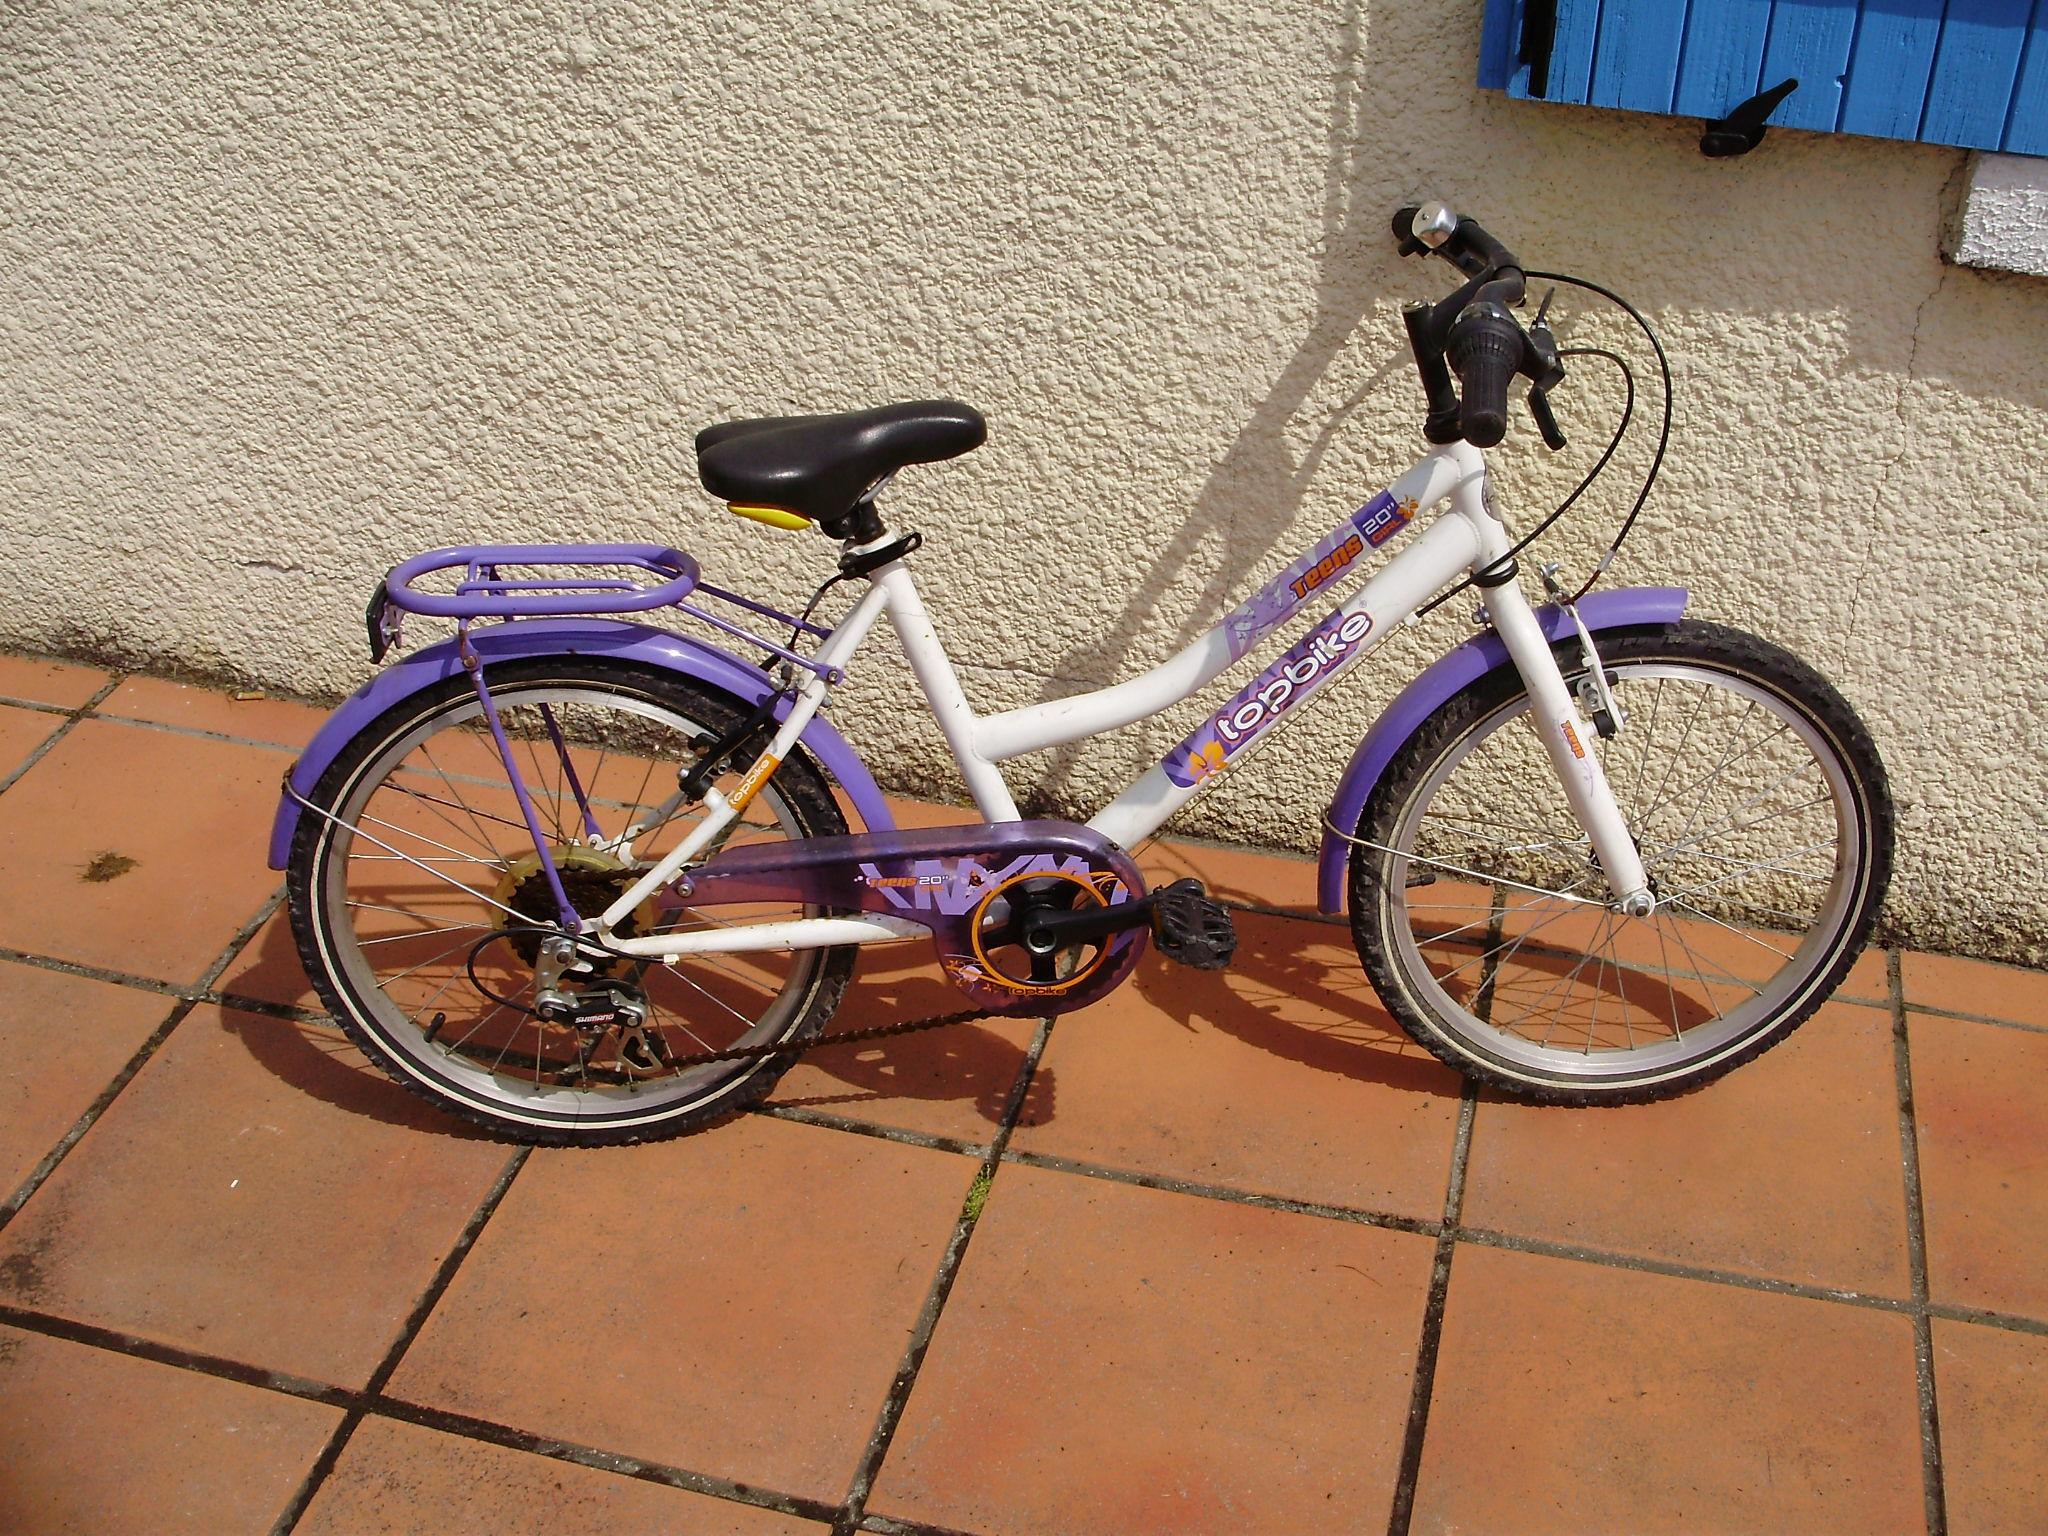 Vente Occasion vélos enfants ile d'Oléron - Vélos 17 Loisirs